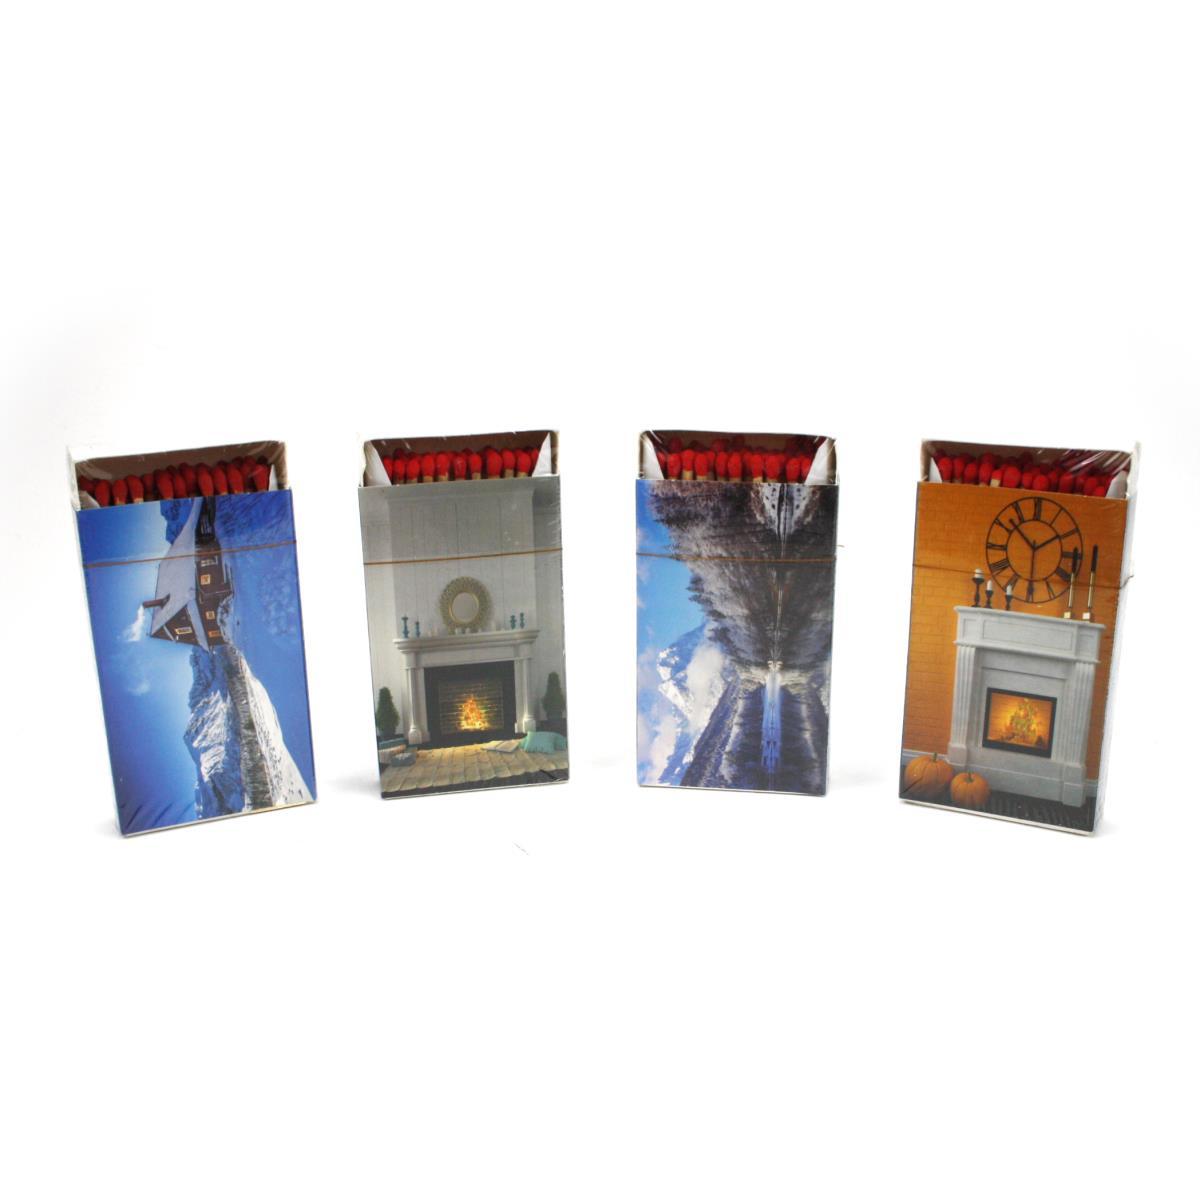 Streichhölzer KaminhölzerZündhölzer 50 Stück Hölzer 10 cm lang ,Flammifera,000051389572, 5907996370627